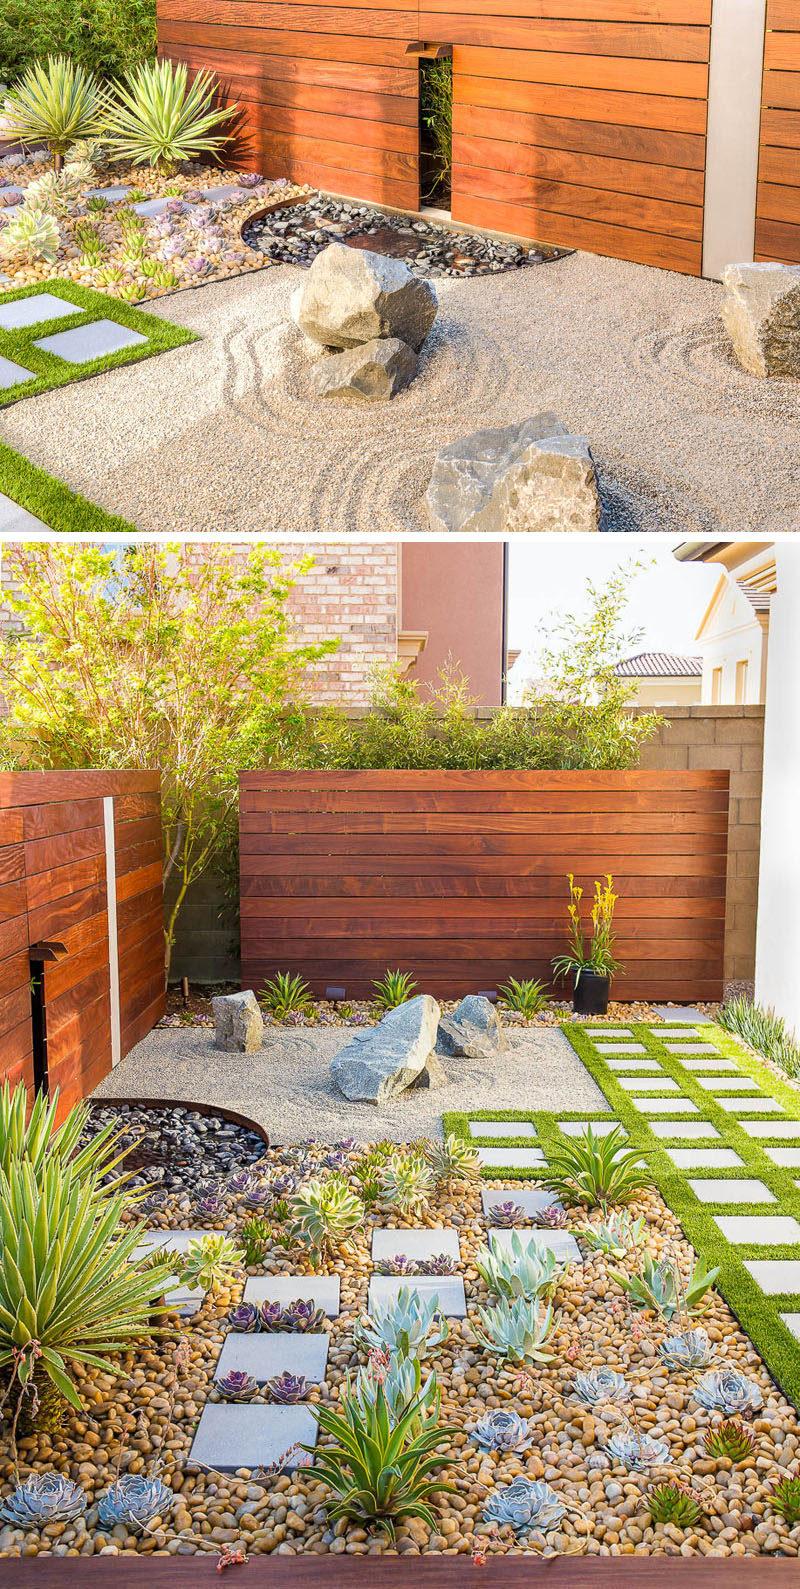 8 Elements To Include When Designing Your Zen Garden ... on Zen Garden Backyard Ideas id=94653